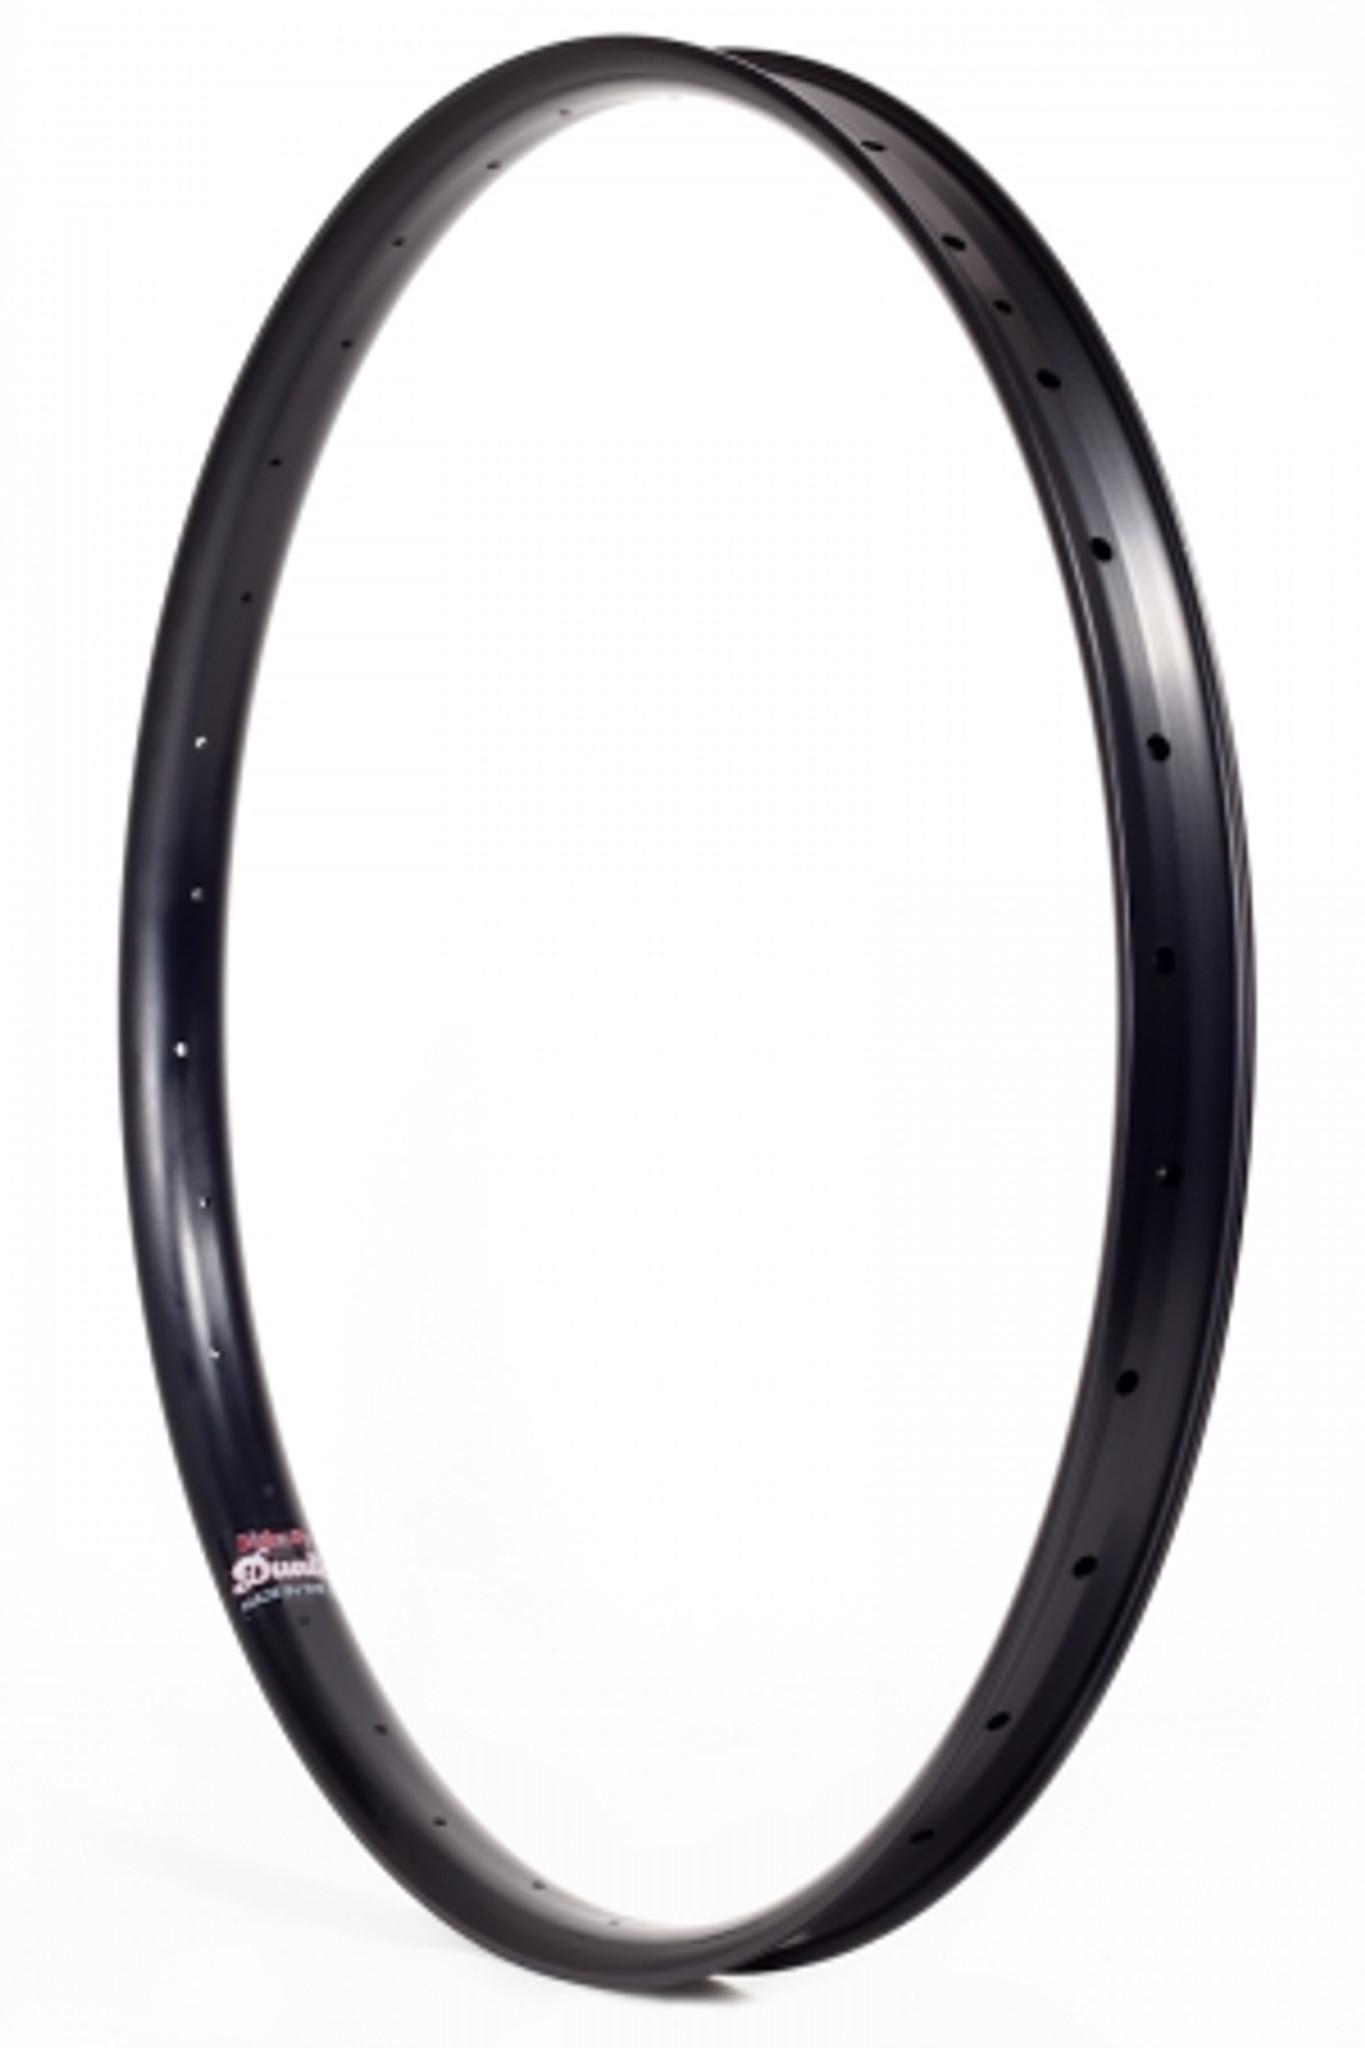 NEW Velocity Dually Rim 45mm 26 rim 32h Black FULL WARRANTY